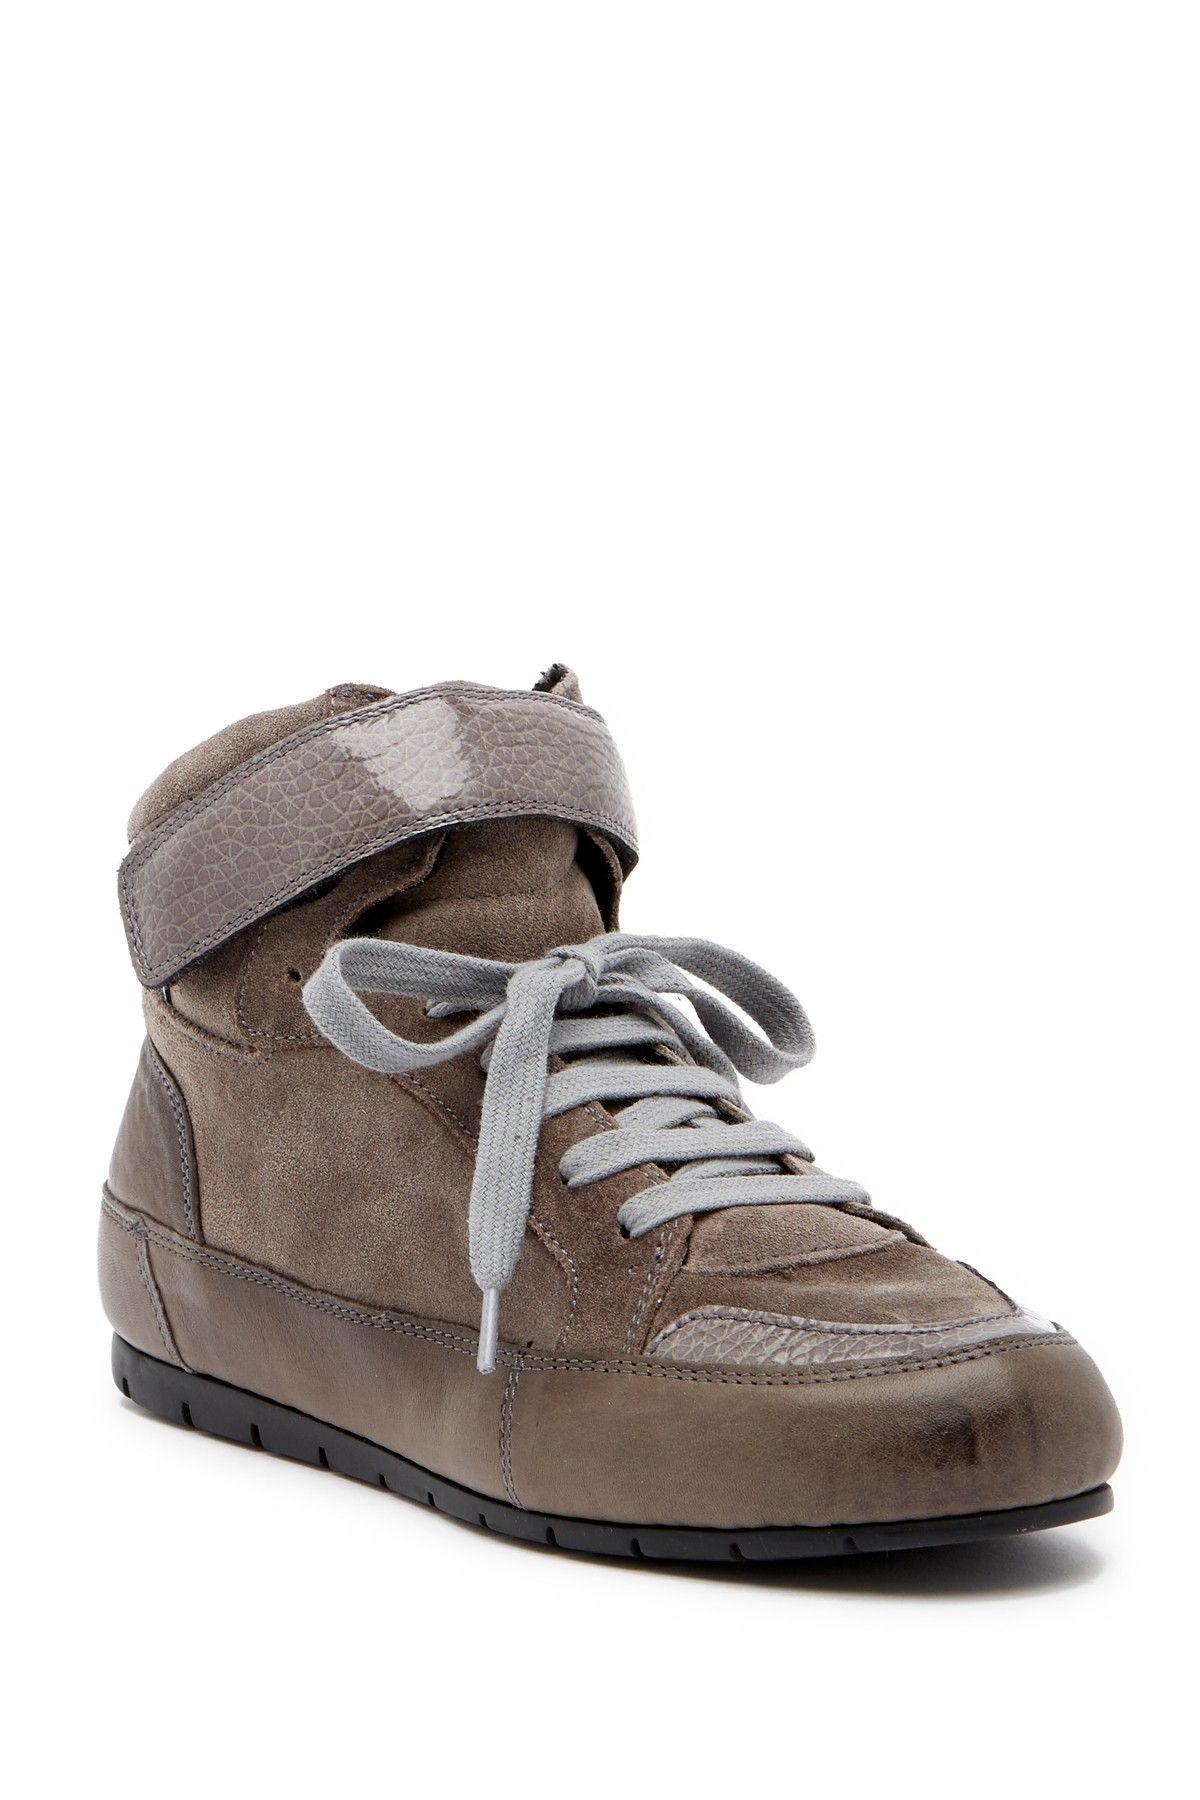 Manas Cap Toe Sneaker N0cHmgL